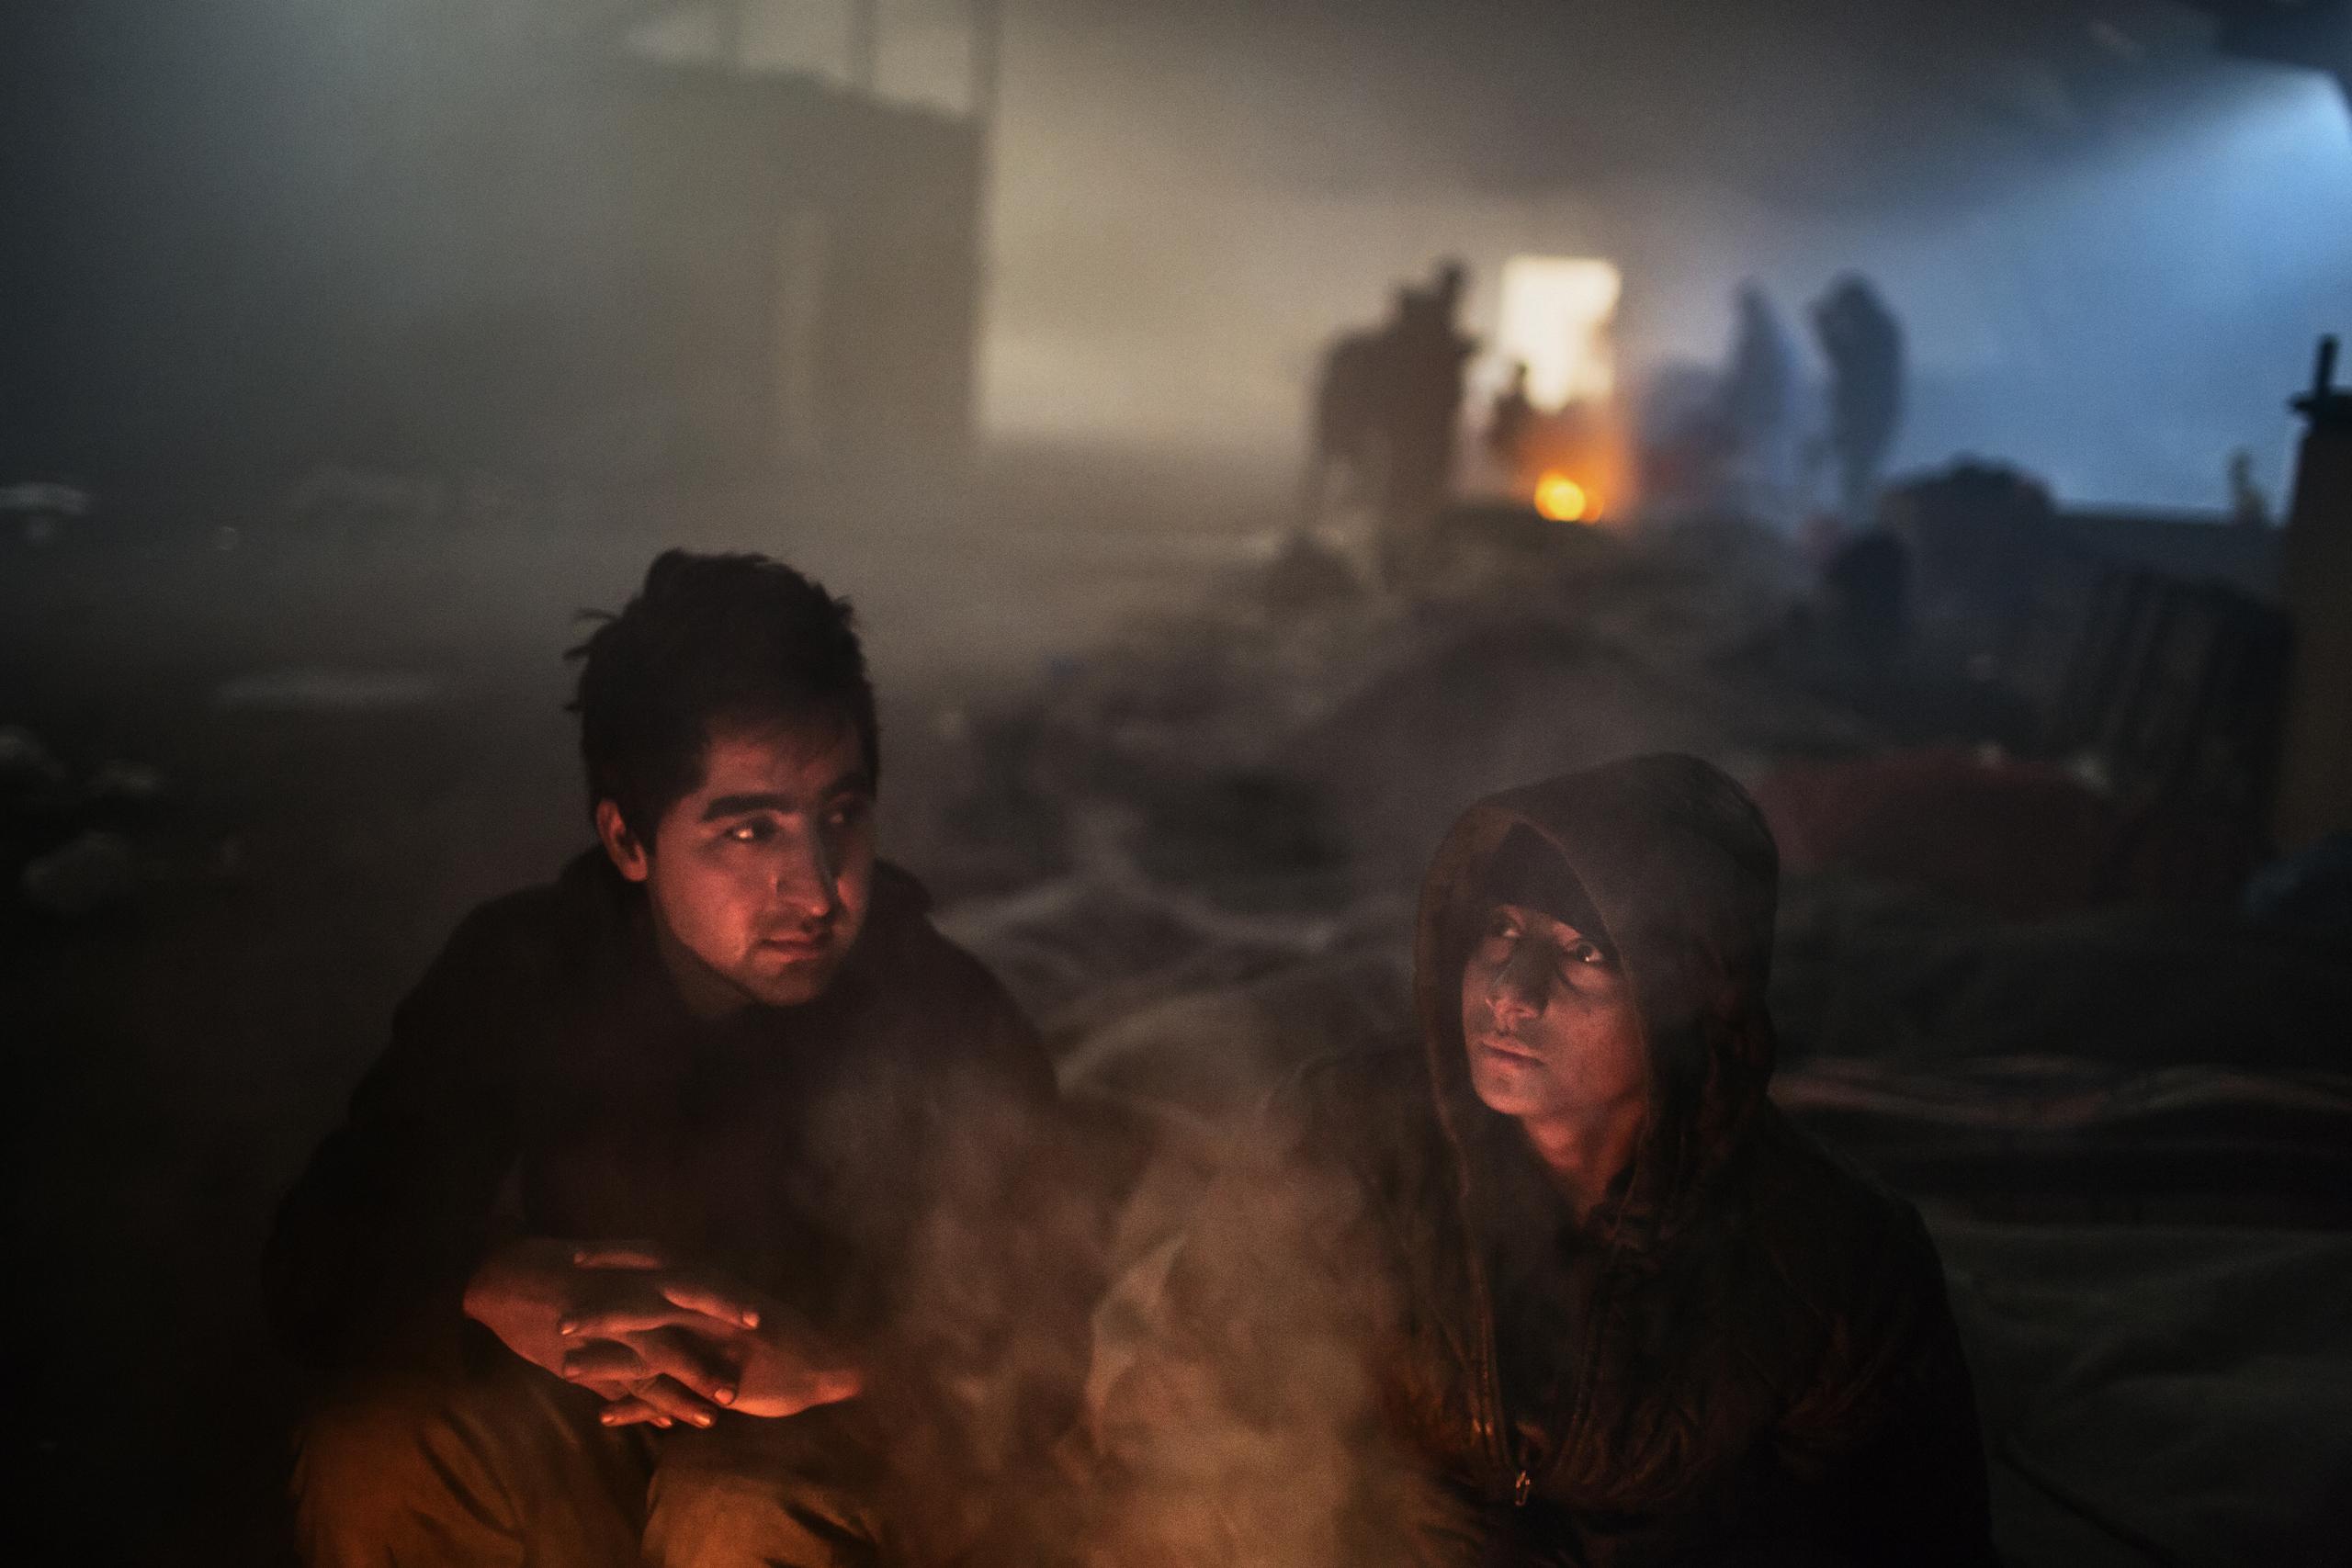 Two unaccompanied minors from afghanistan stay warm inside an abandoned warehouse in Belgrade, Jan 13, 2017.